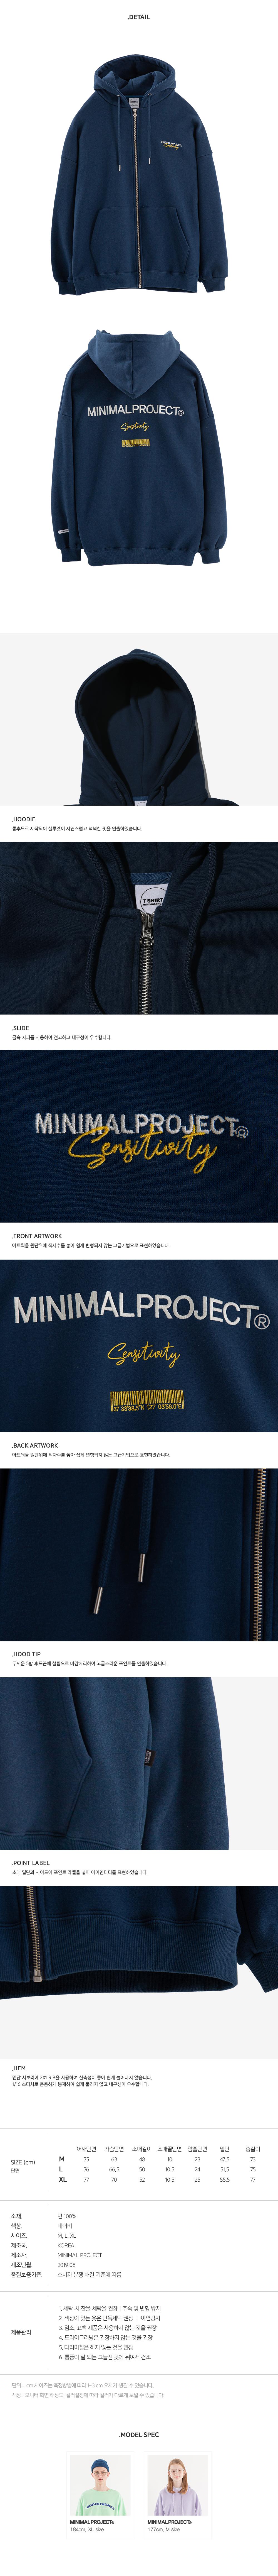 [minimal project] 미니멀프로젝트 바코드 자수 오버핏 후드집업 MZT103 [NAVY]